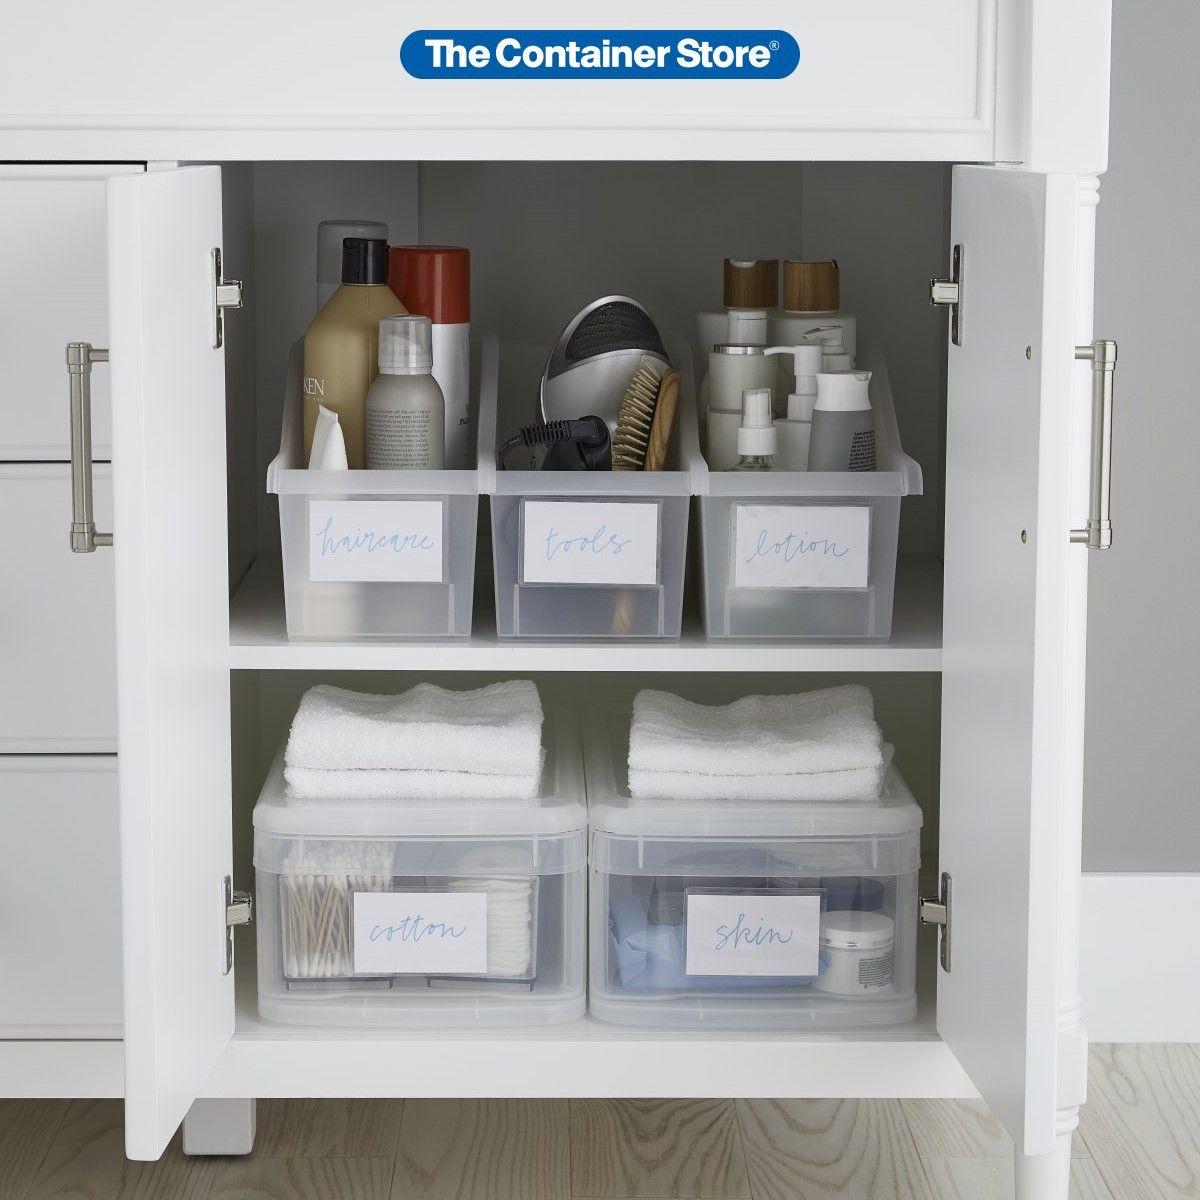 Undersink Bathroom Storage Pictured Iris Connecting Storage Bins Item 10076099 Small Tint Undersink Bathroom Storage Storage Bins With Lids Toy Storage